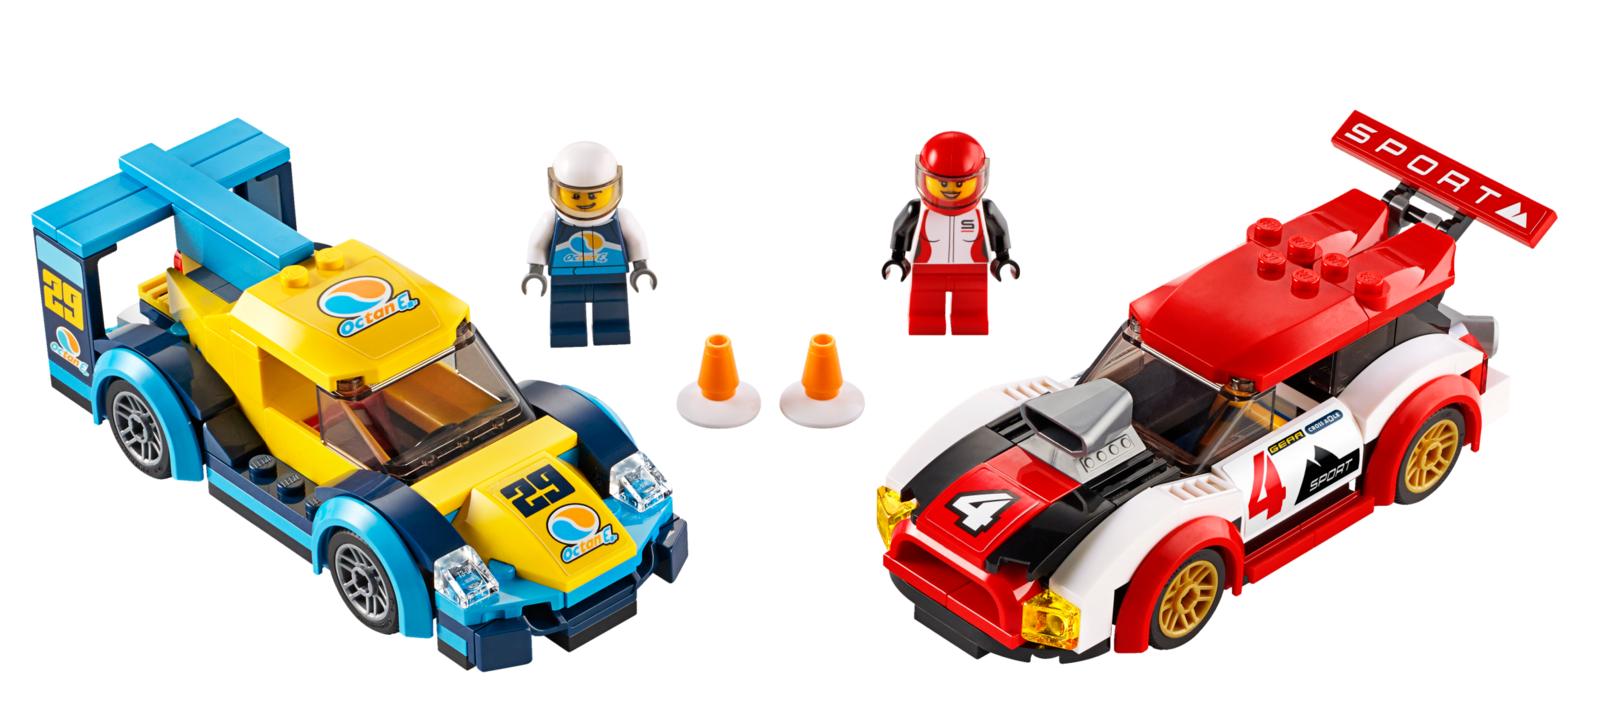 LEGO City: Racing Cars - (60256) image